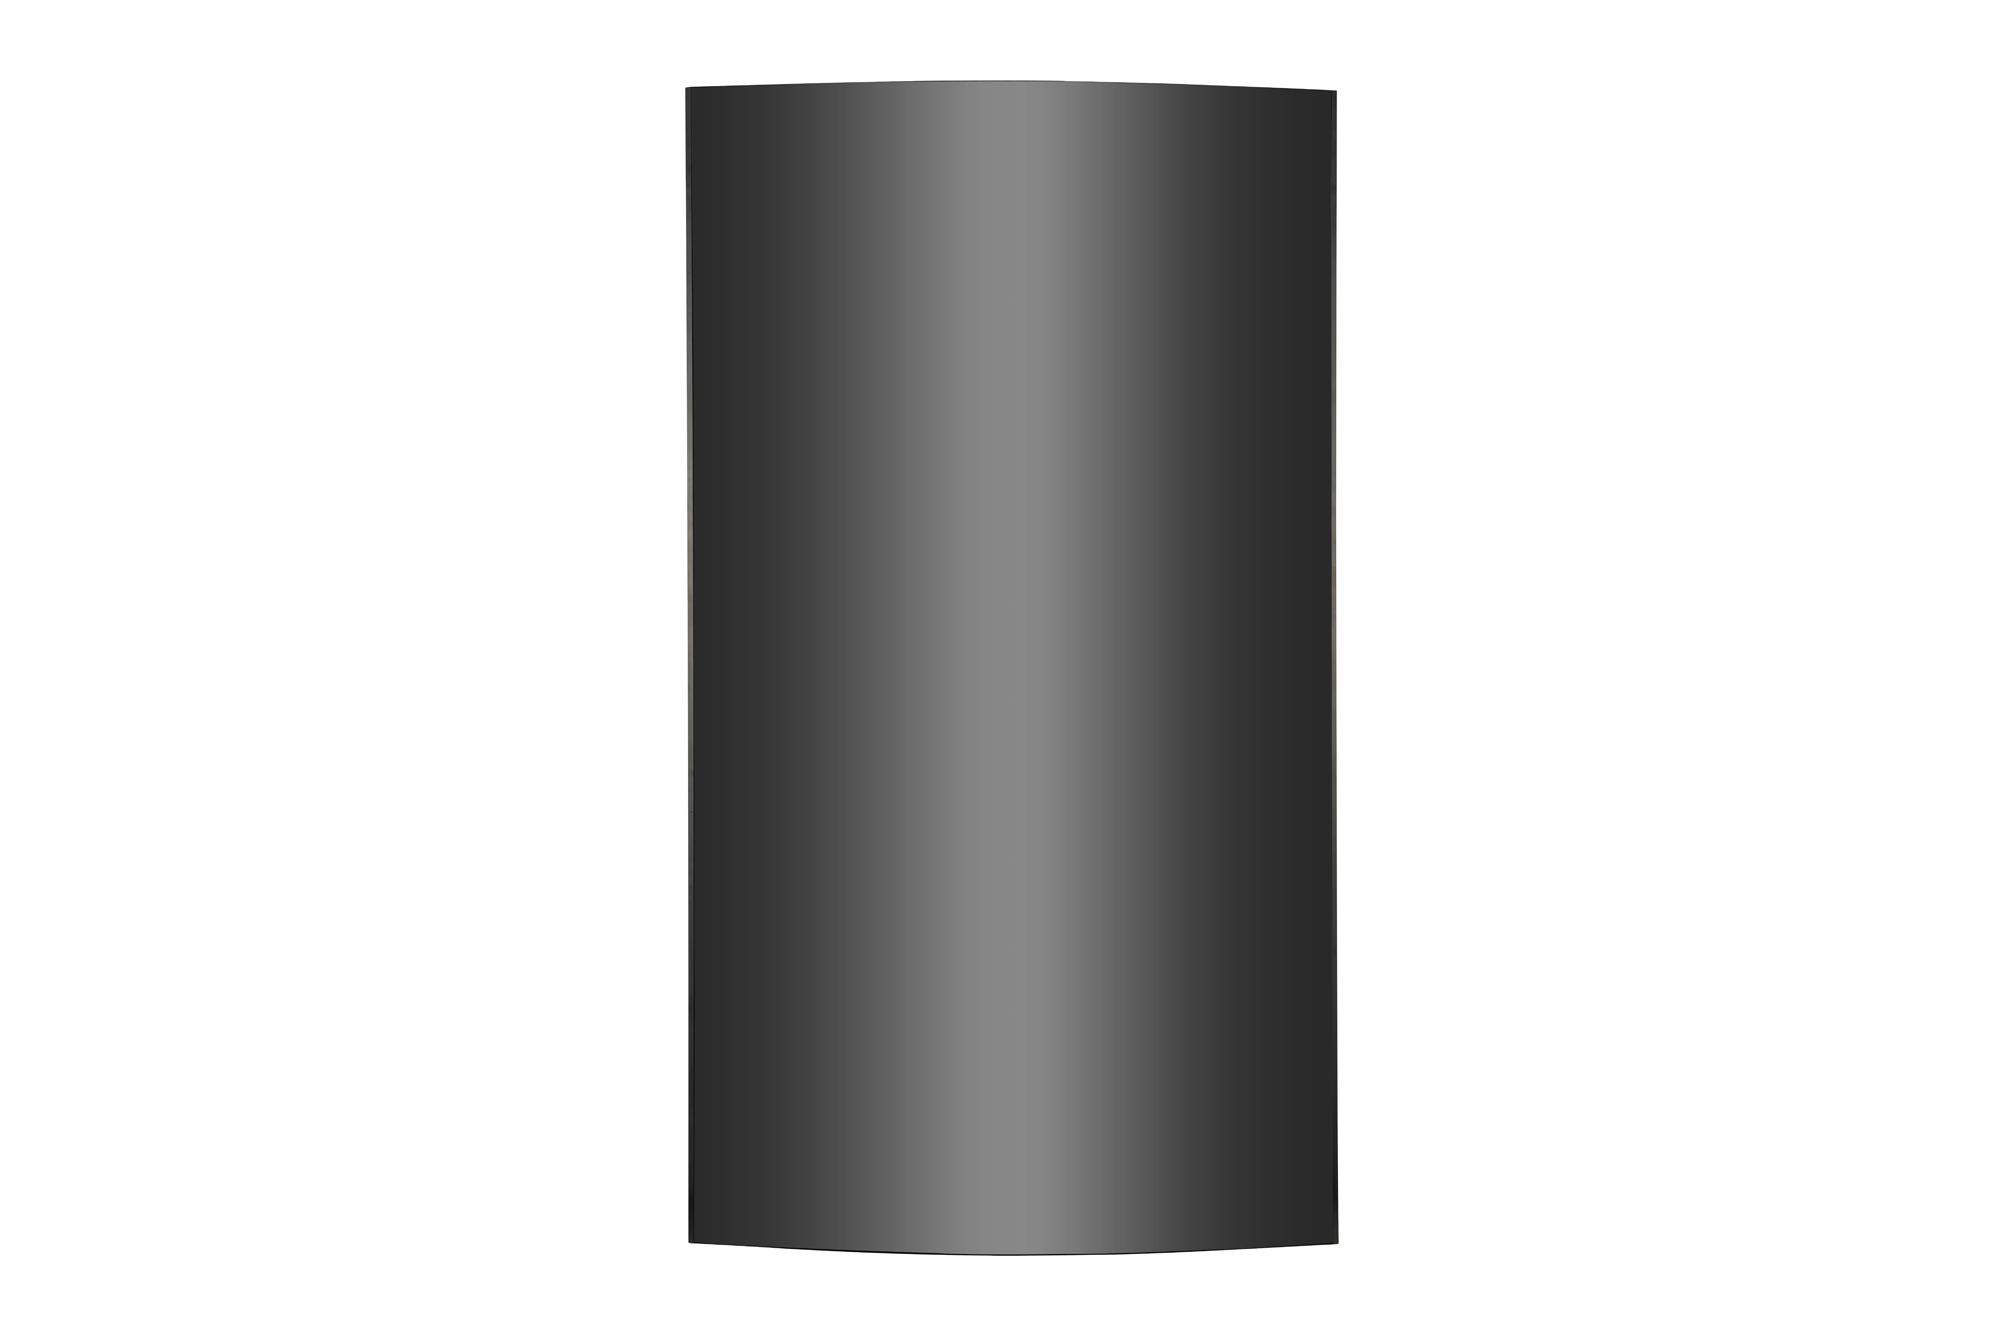 LG Curvable OLED 55EF5F-P 2